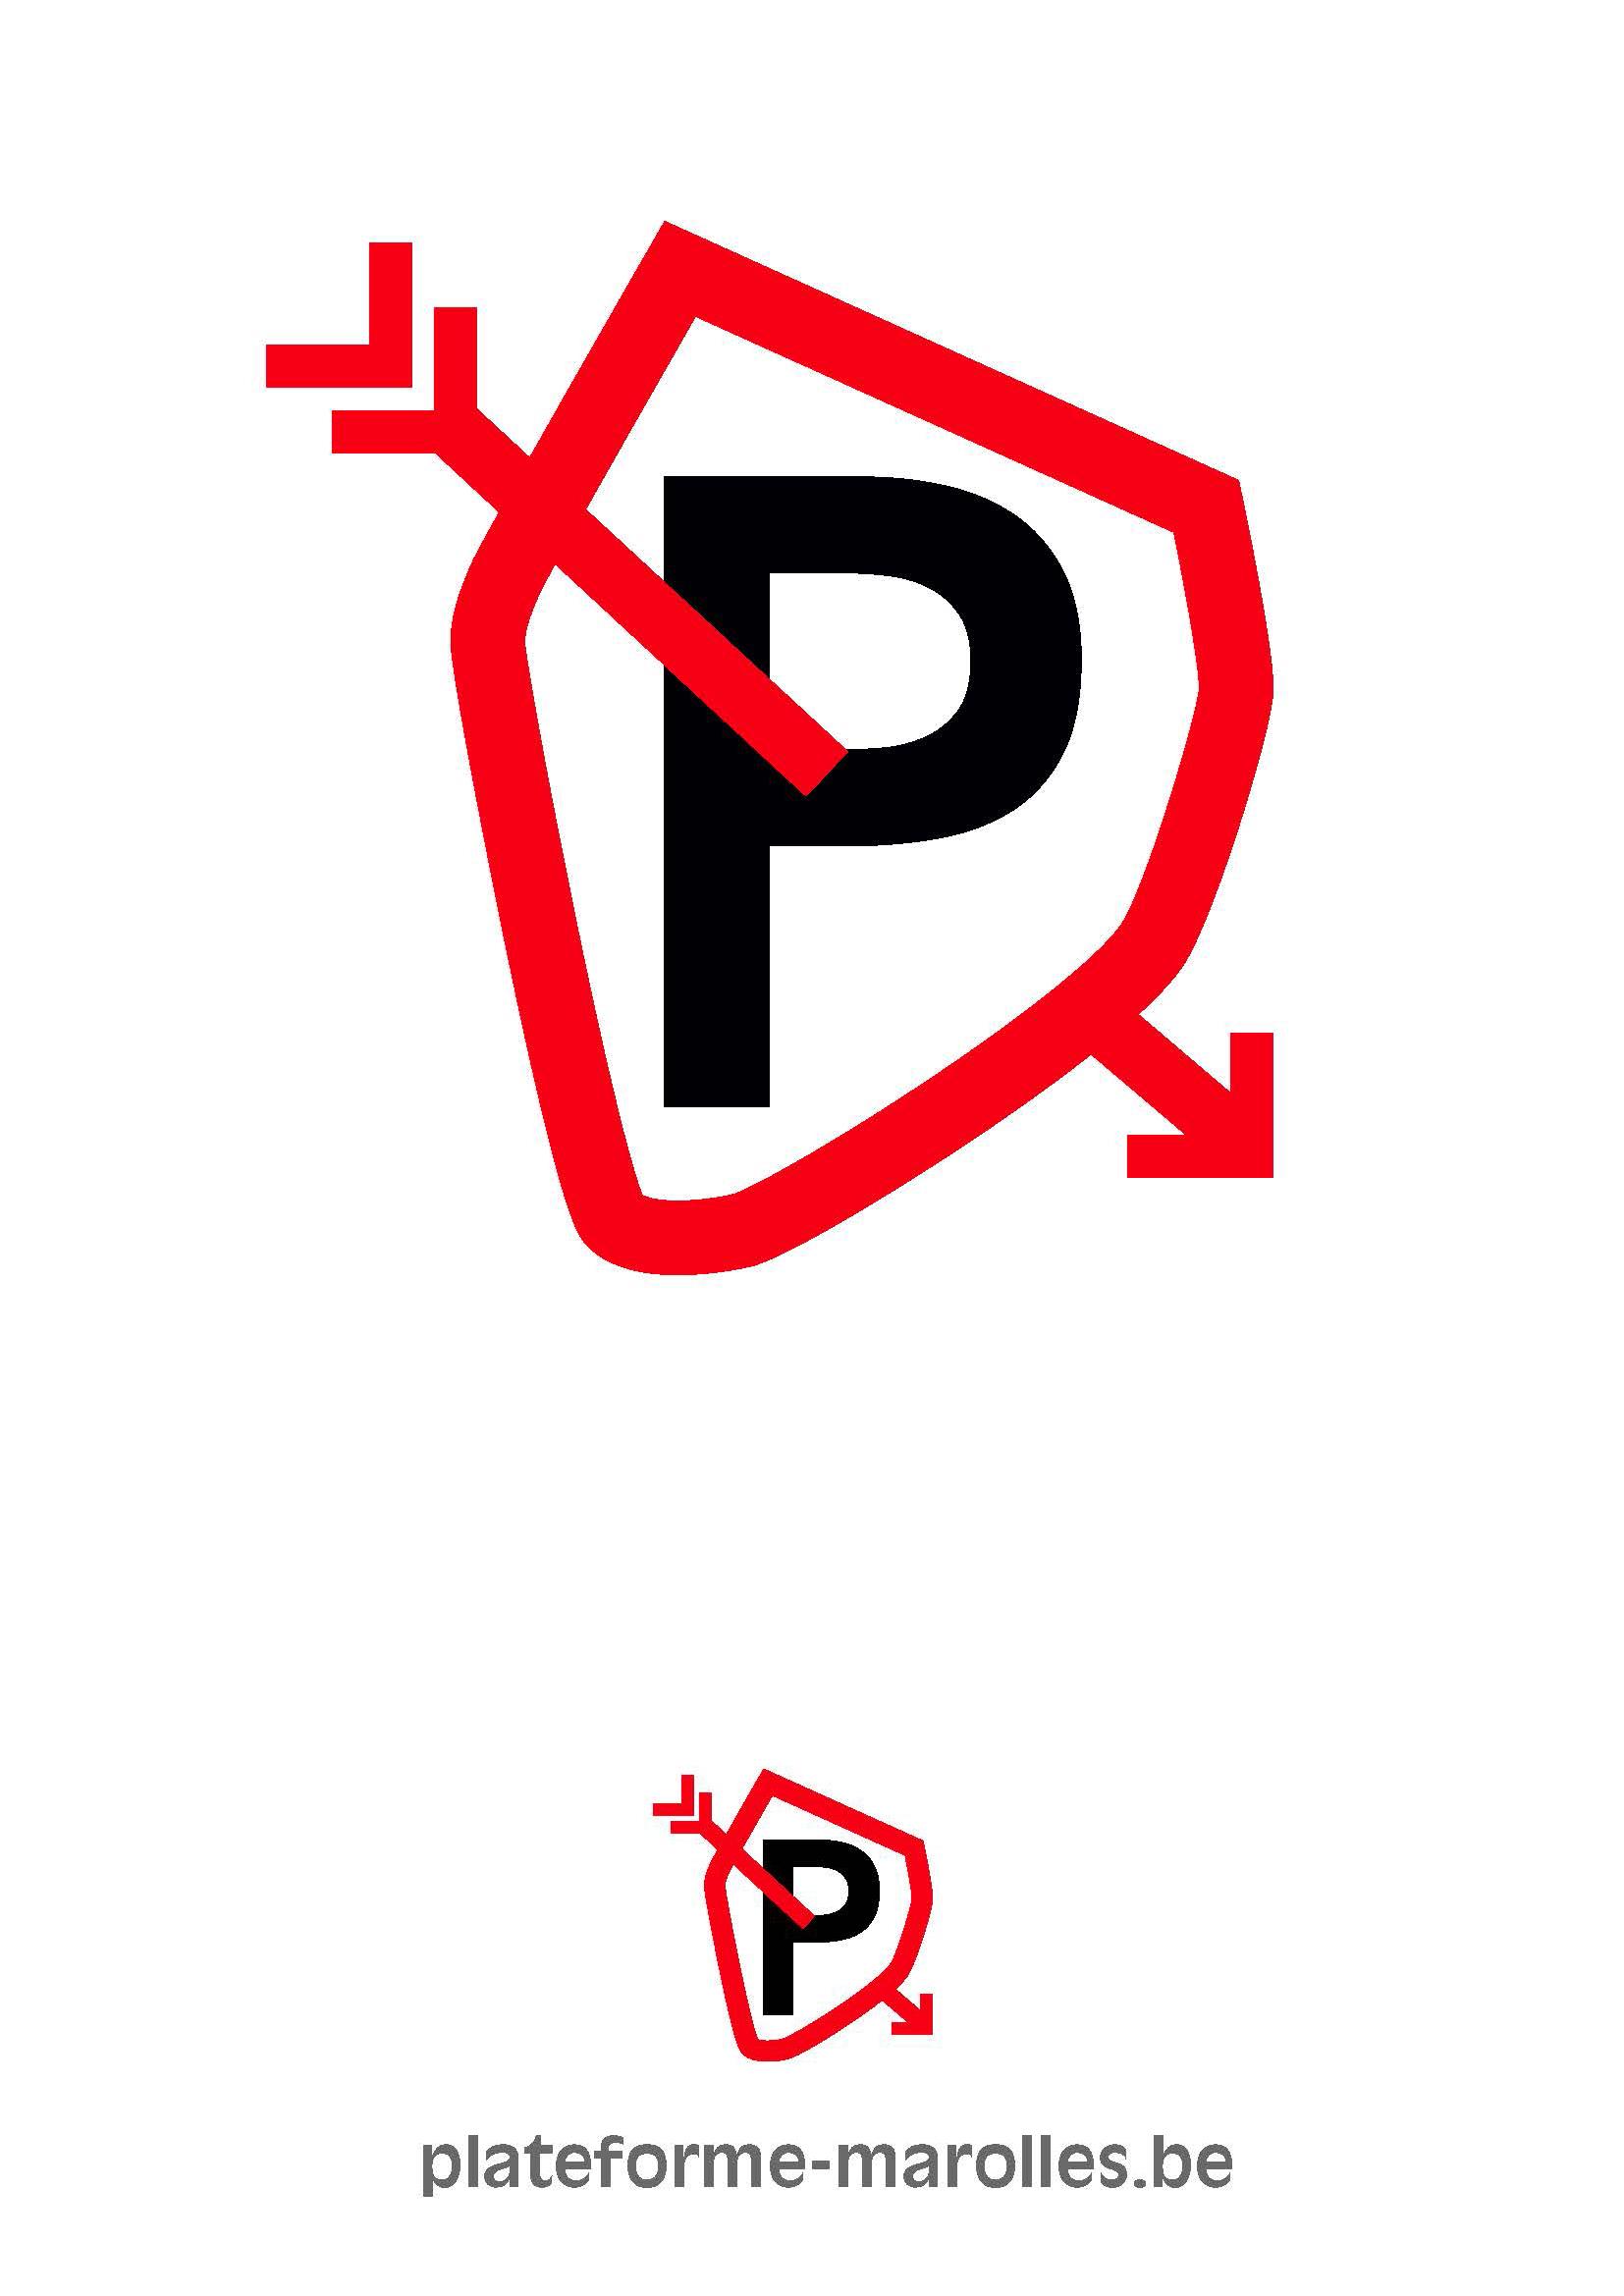 logo_plateforme-marolles